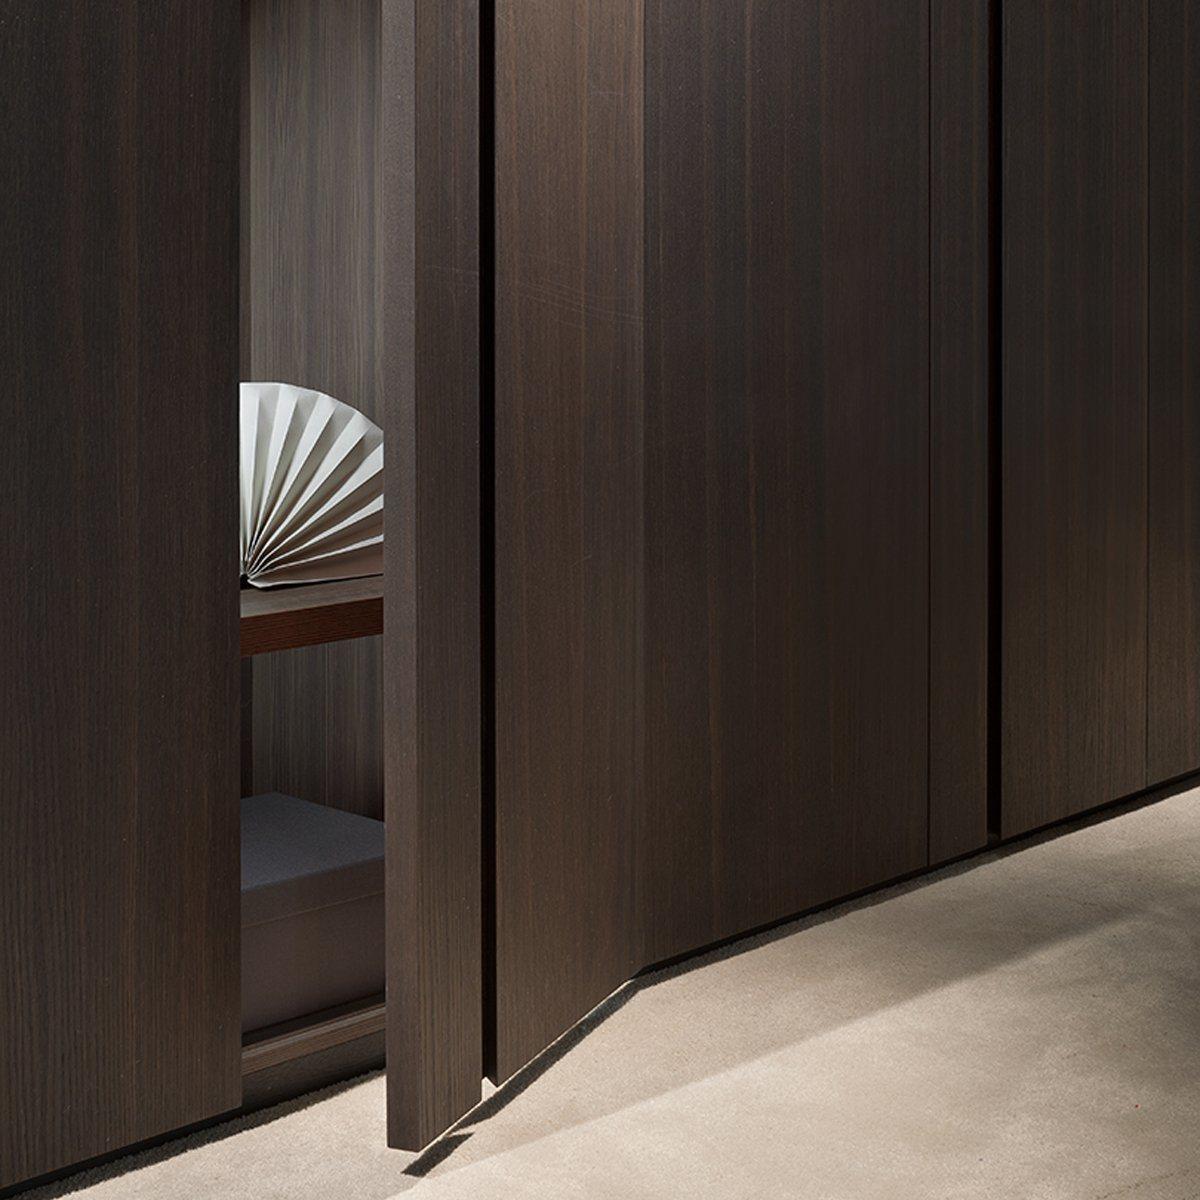 Wood Grain Melamine Laminate Wardrobe Bedroom Furniture Popular